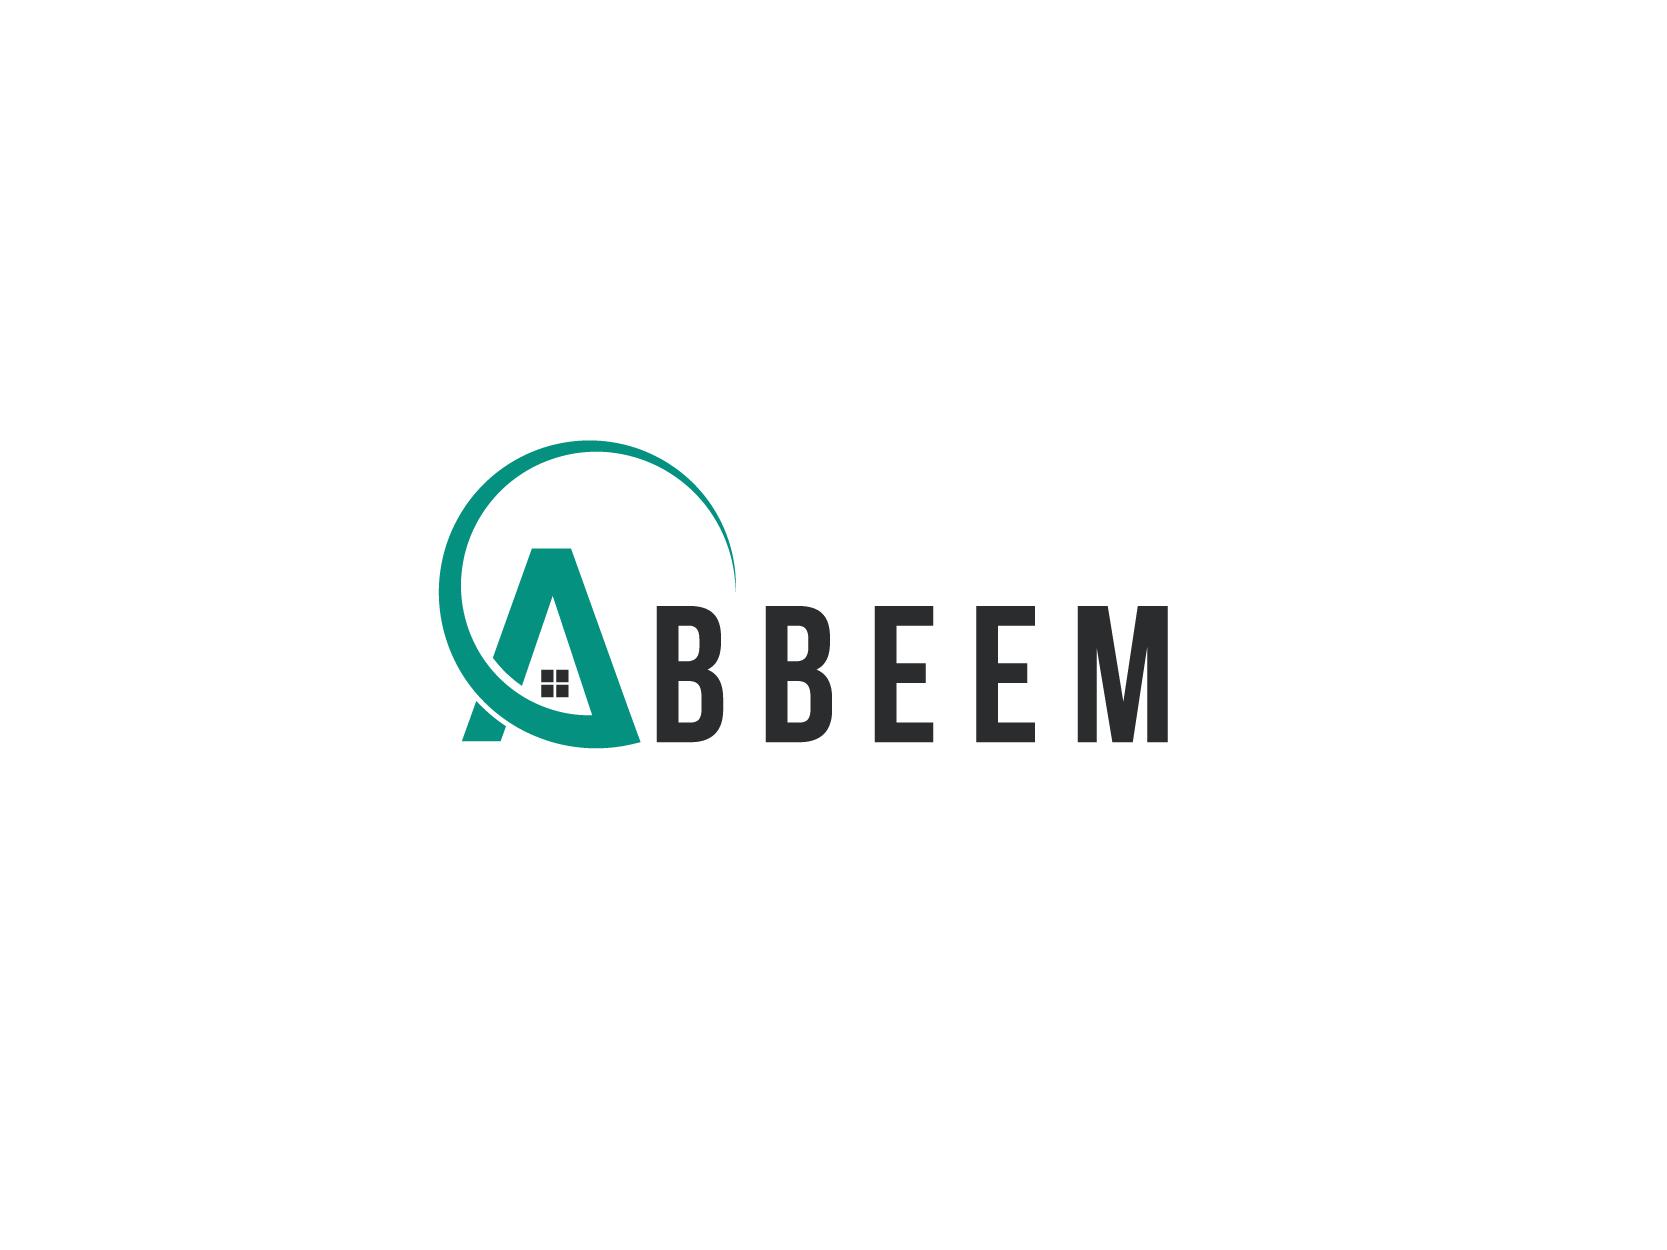 Logo Design by Faraz Baloch - Entry No. 161 in the Logo Design Contest Luxury Logo Design for Abbeem.